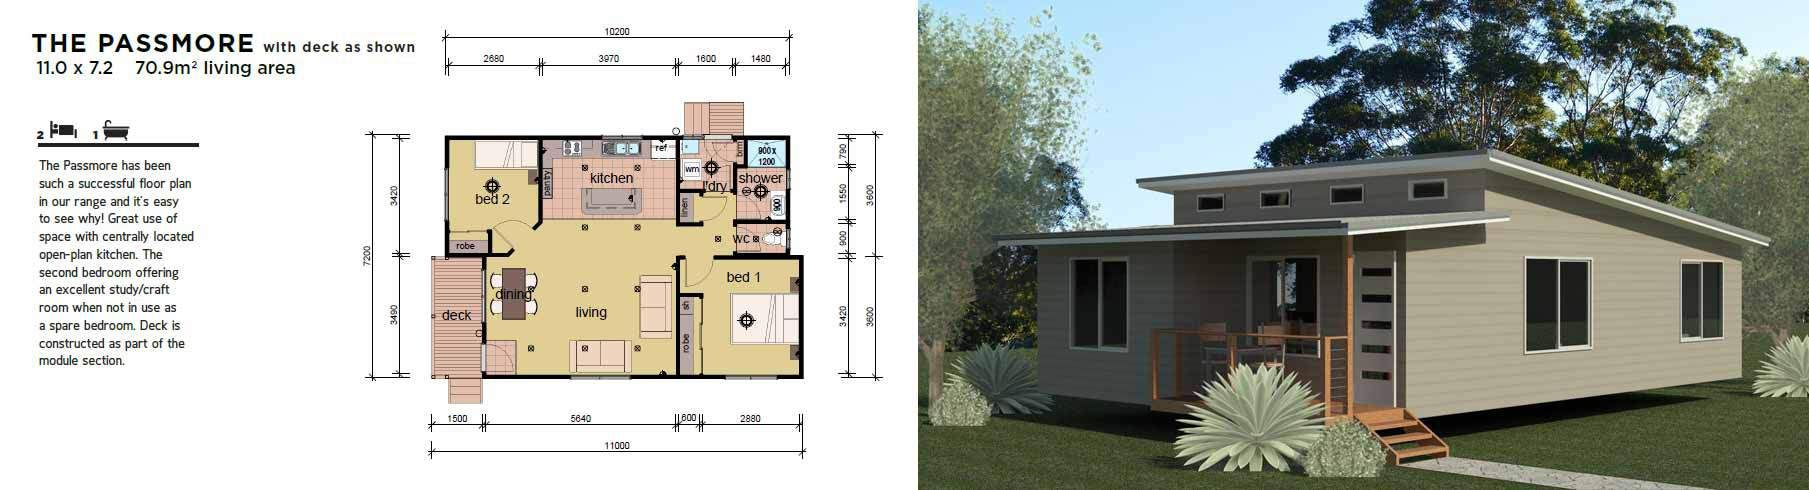 2 Bedroom Modular Home Floor Plan Particular Home Decoration Interior House Designer